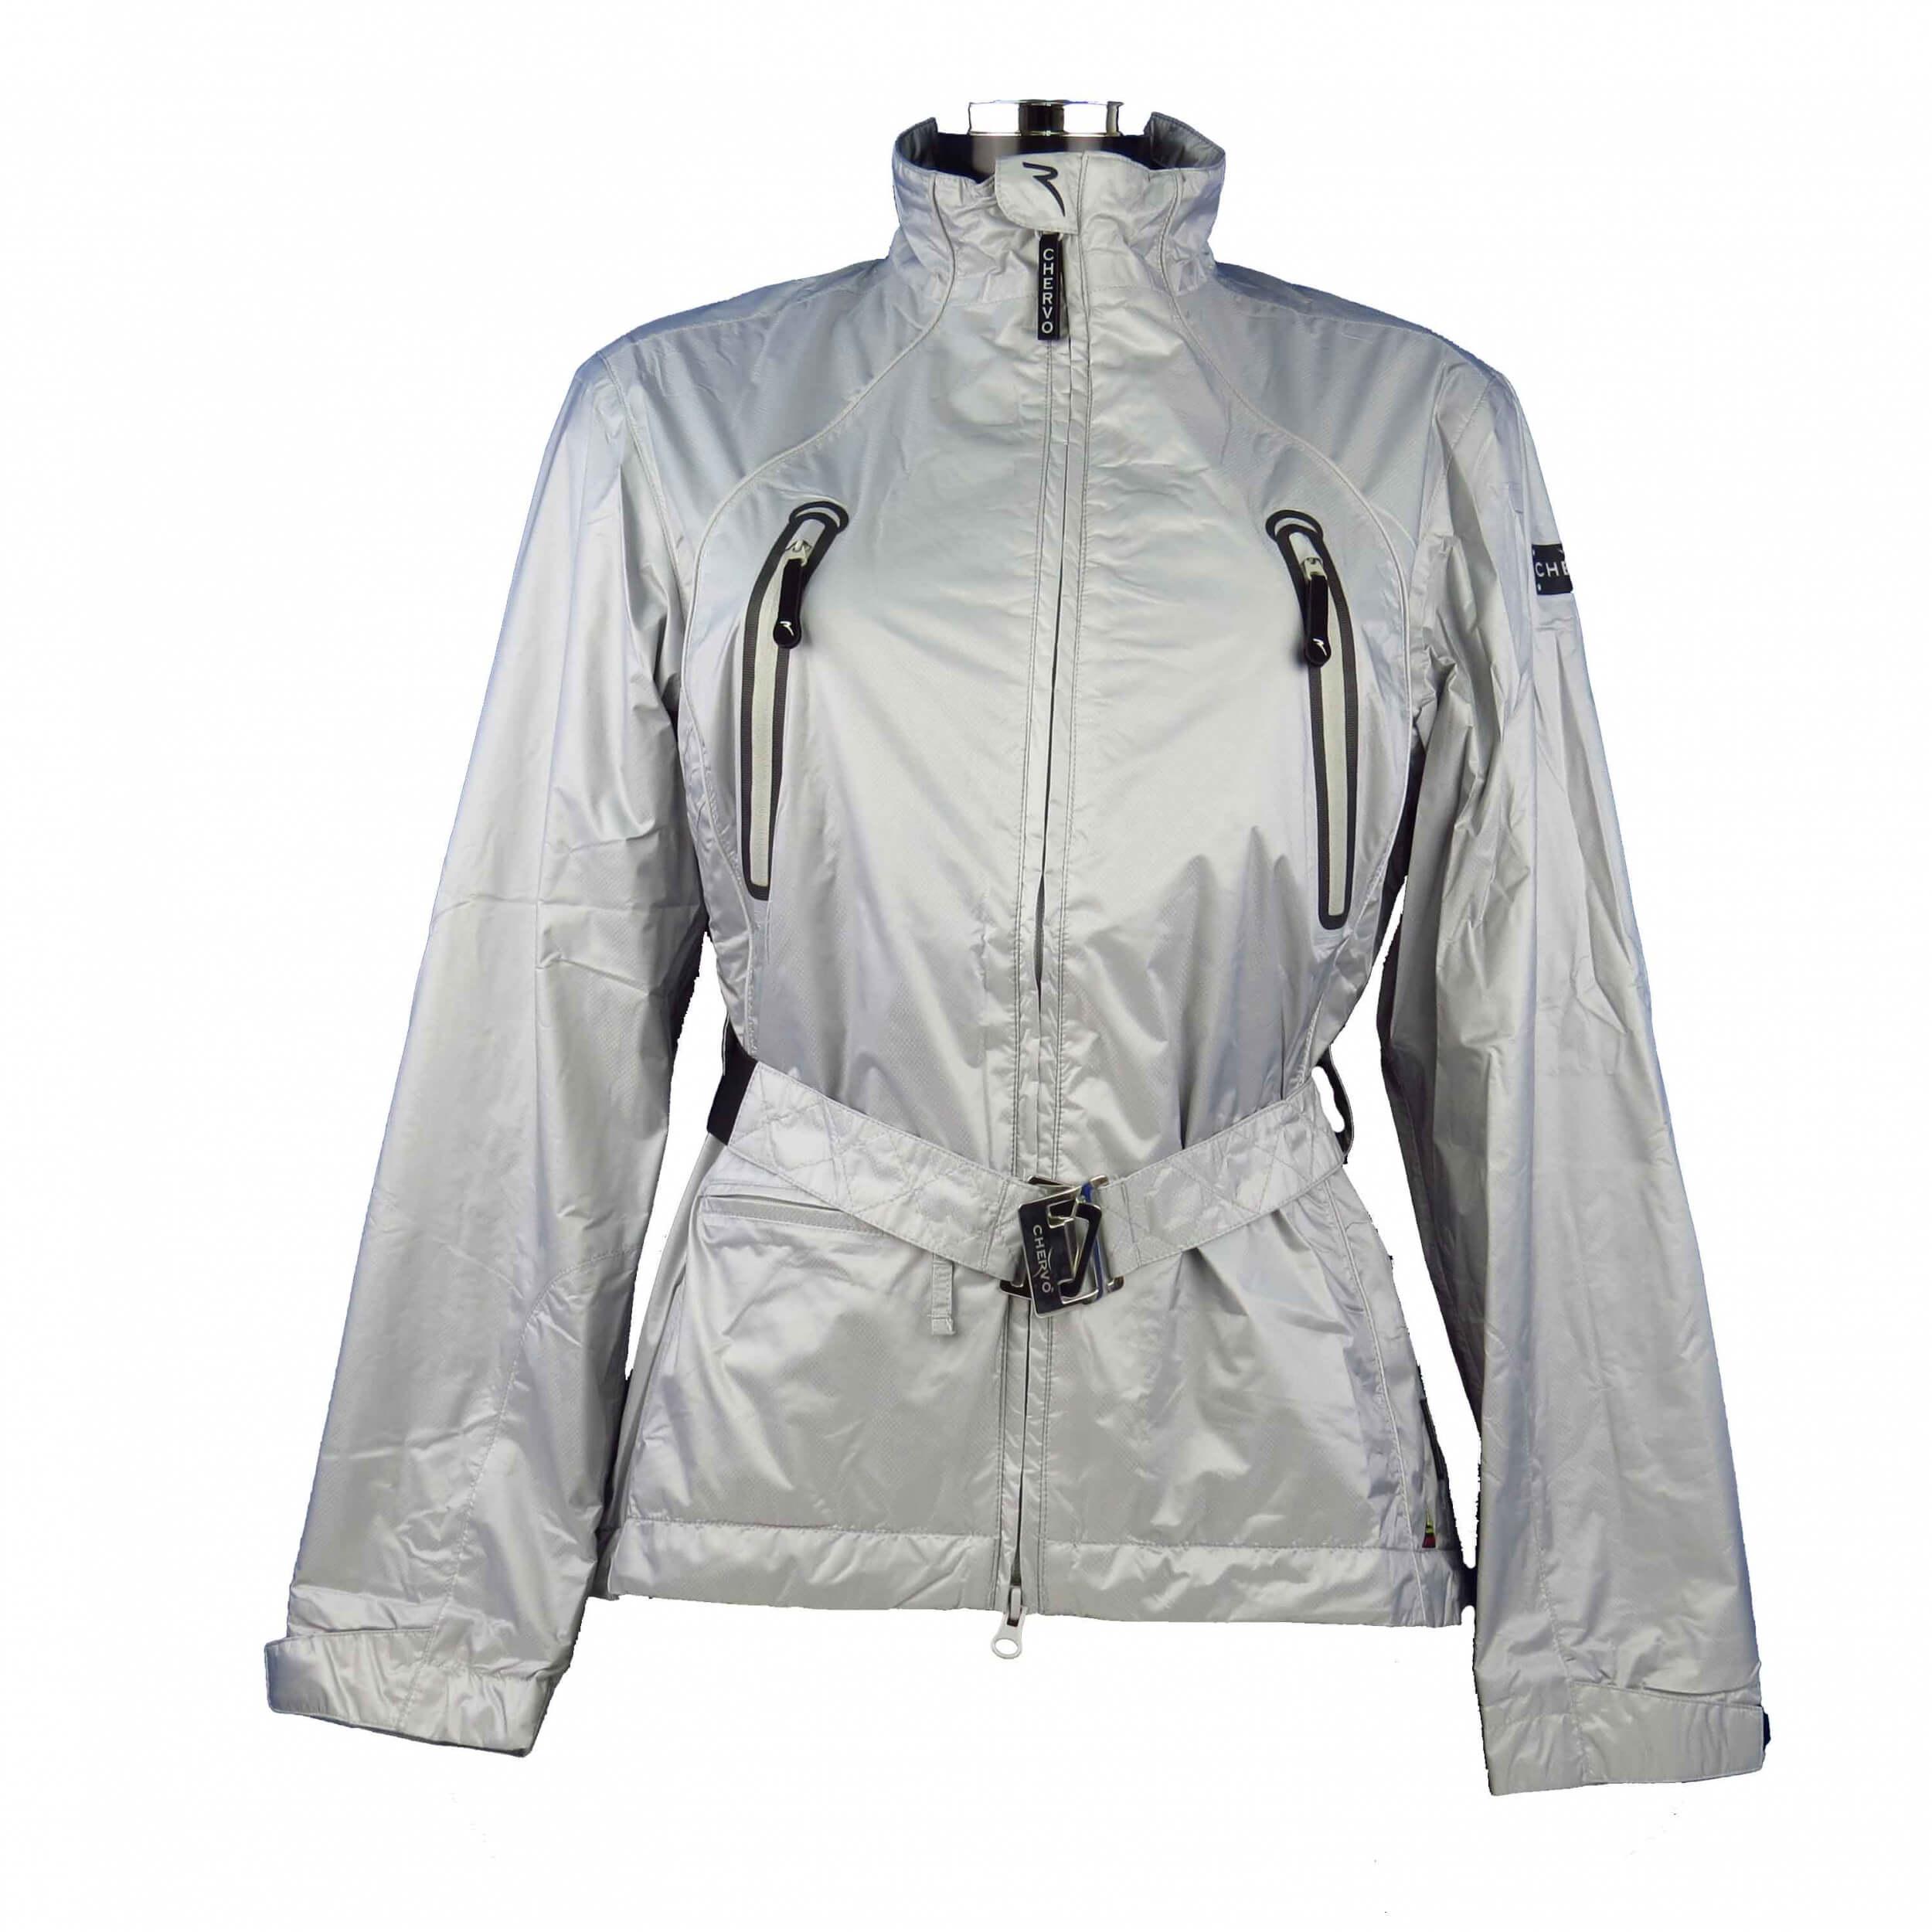 7a7a6a2d Chervo Golf Womens Rain Jacket Aqua Block Macaron Silver 198 New | eBay